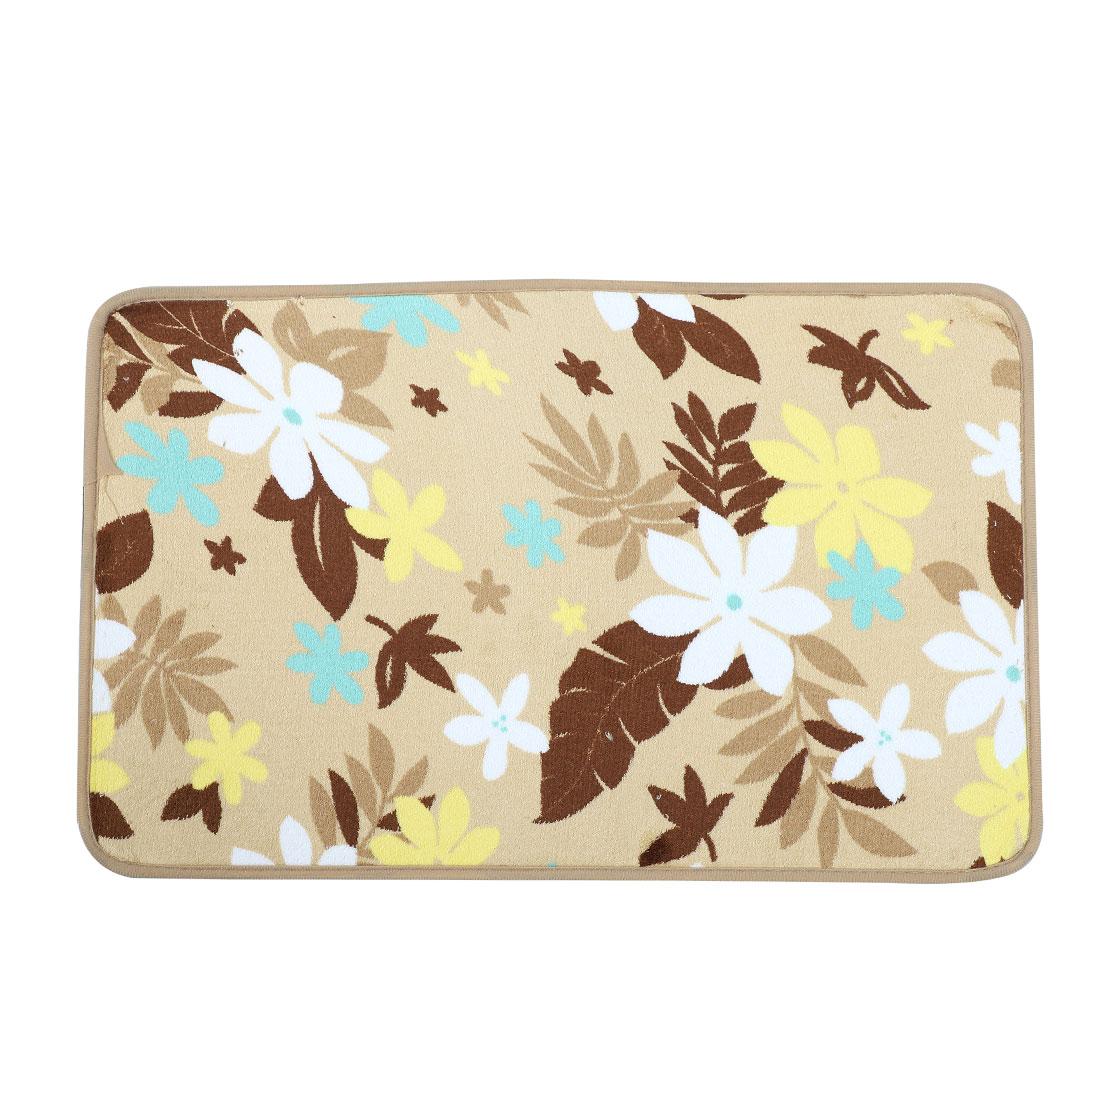 Beige Flower Leaves Print Bathroom Floor Mat Area Rug Carpet 60cm x 40cm